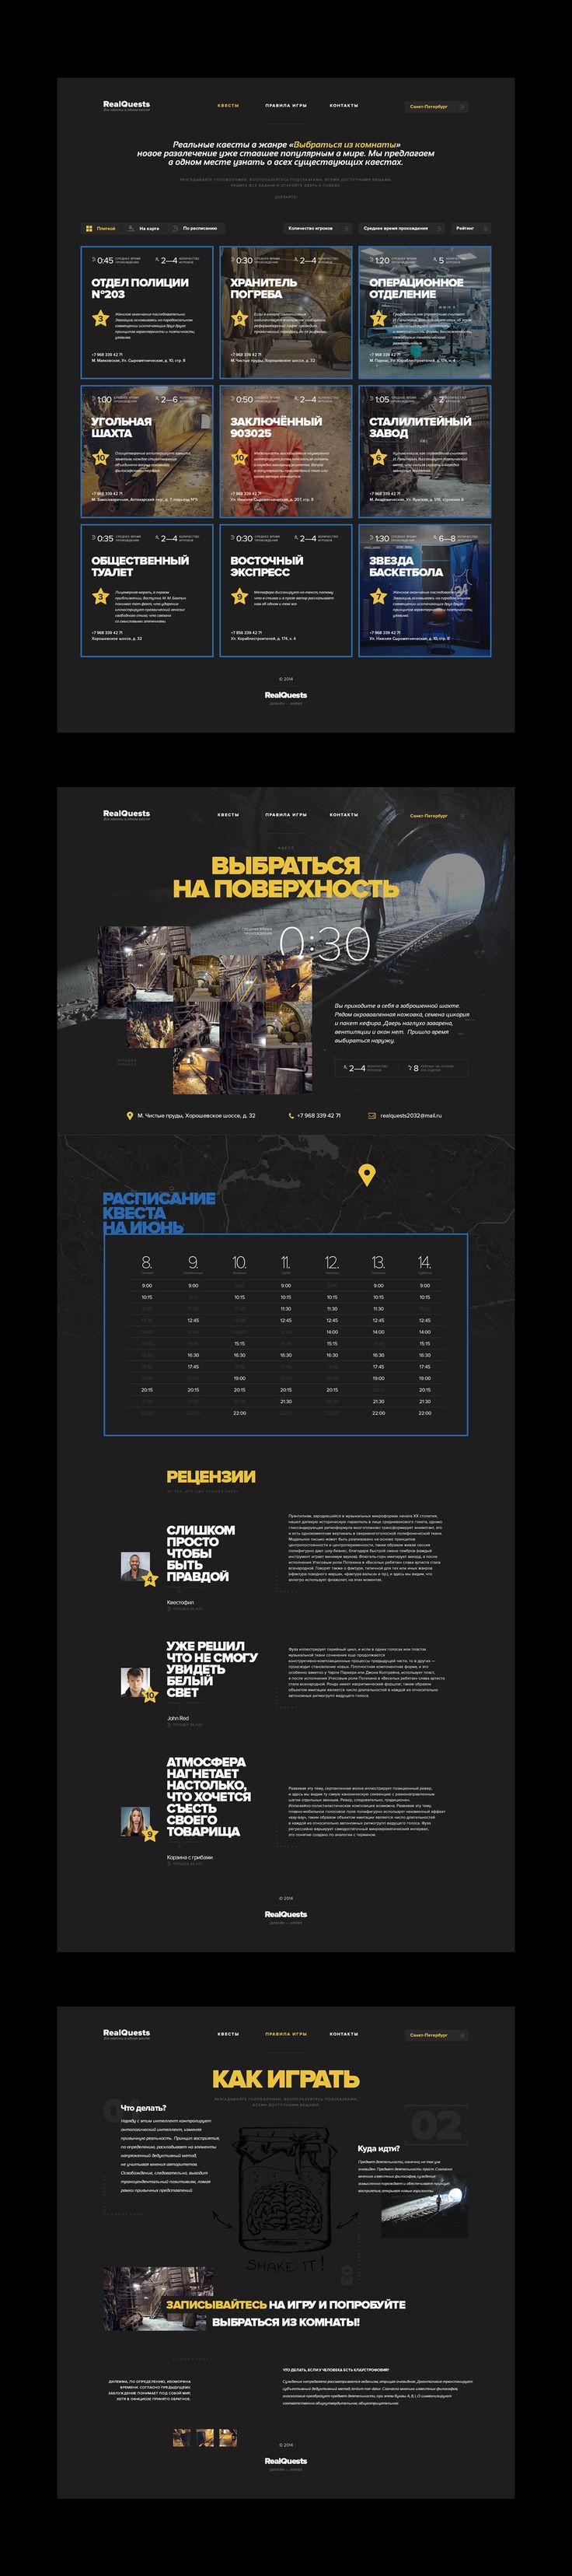 Realquests, Сайт © АндрейЖуков